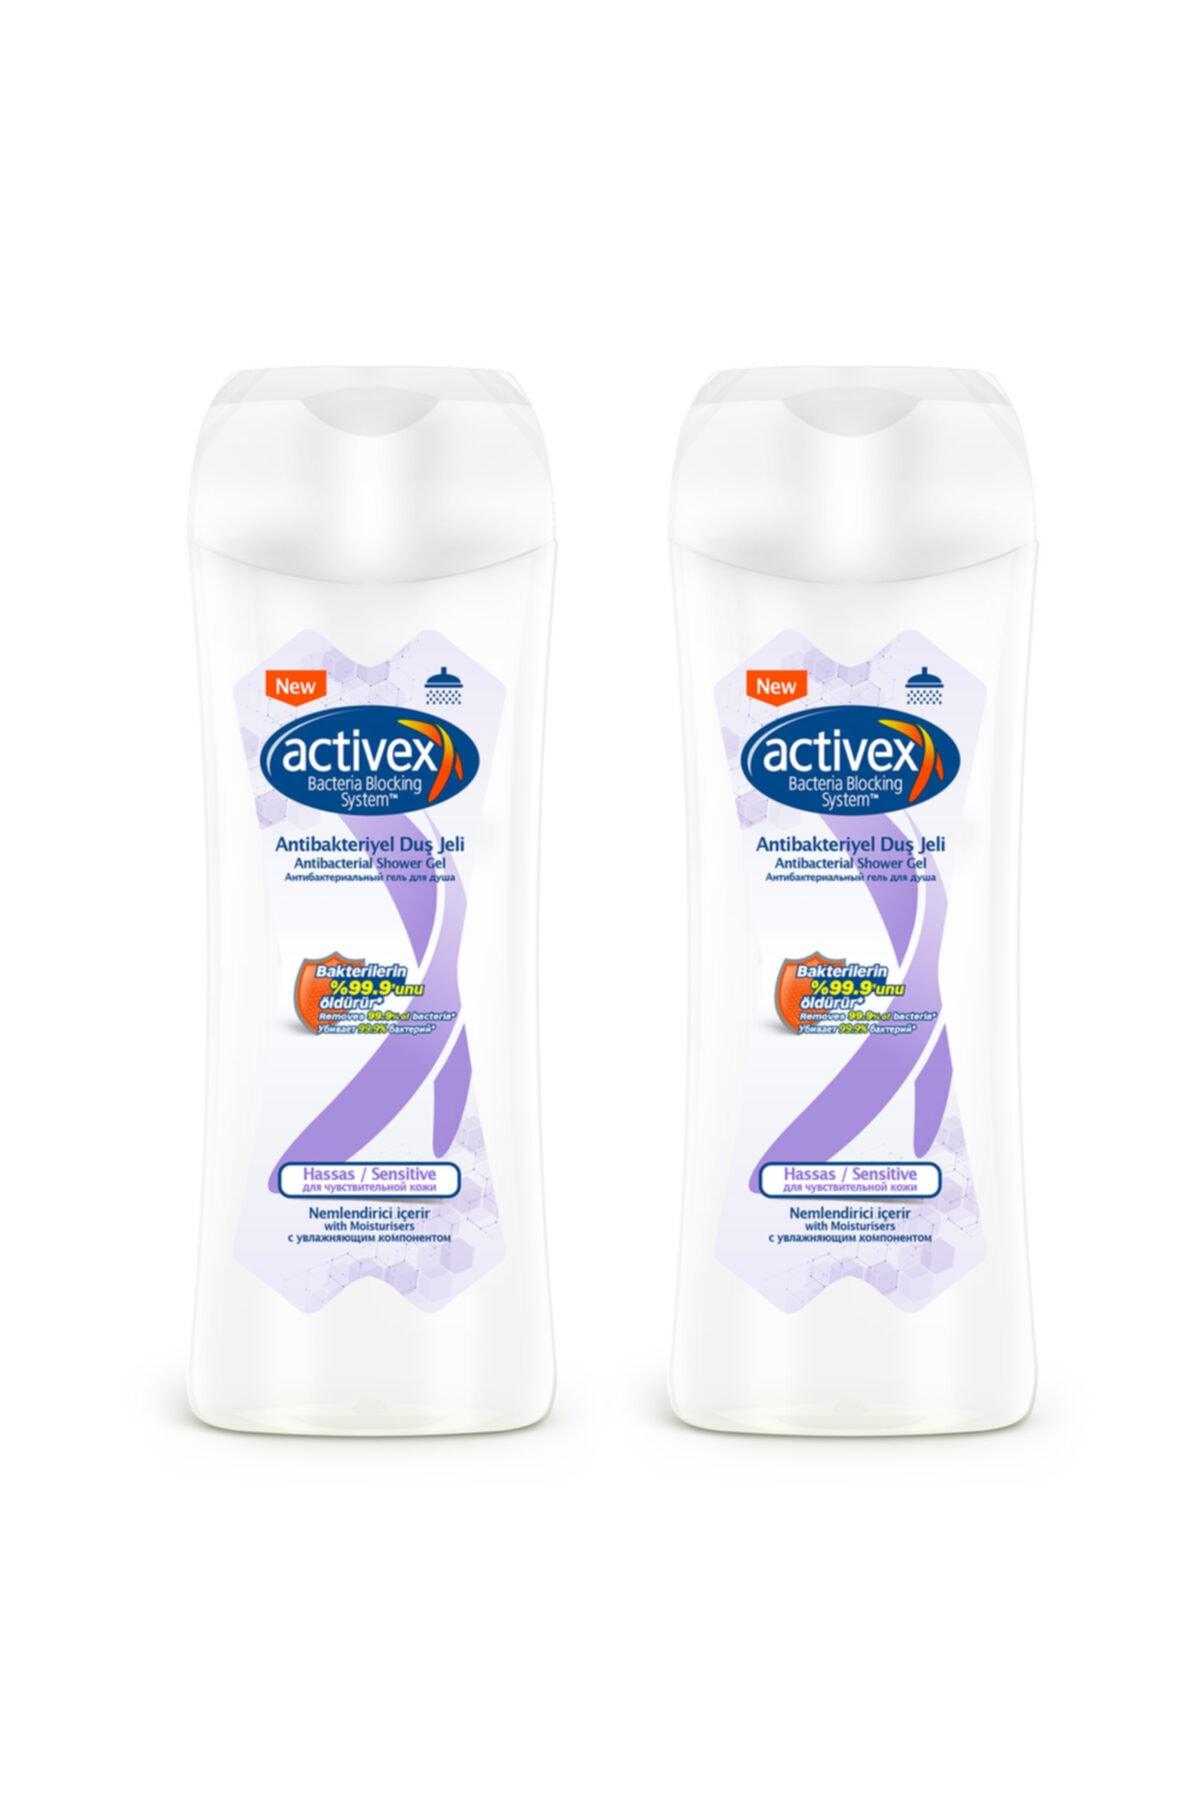 Activex Antibakteriyel Duş Jeli Hassas 2x450ml 1